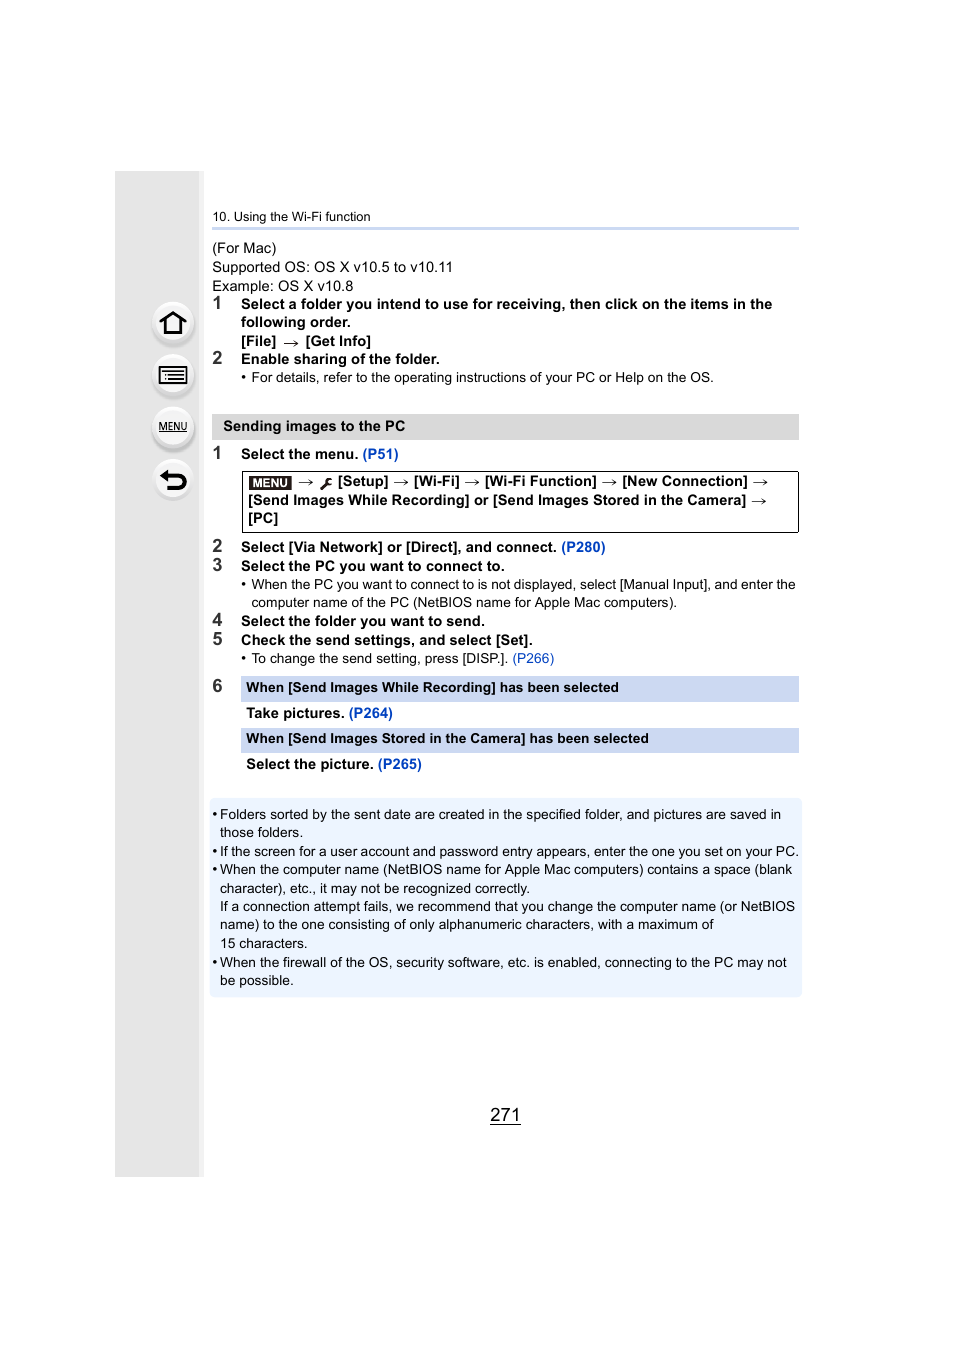 panasonic lumix dmc g85m user manual page 271 338 originalpanasonic lumix dmc g85m user manual page 271 338